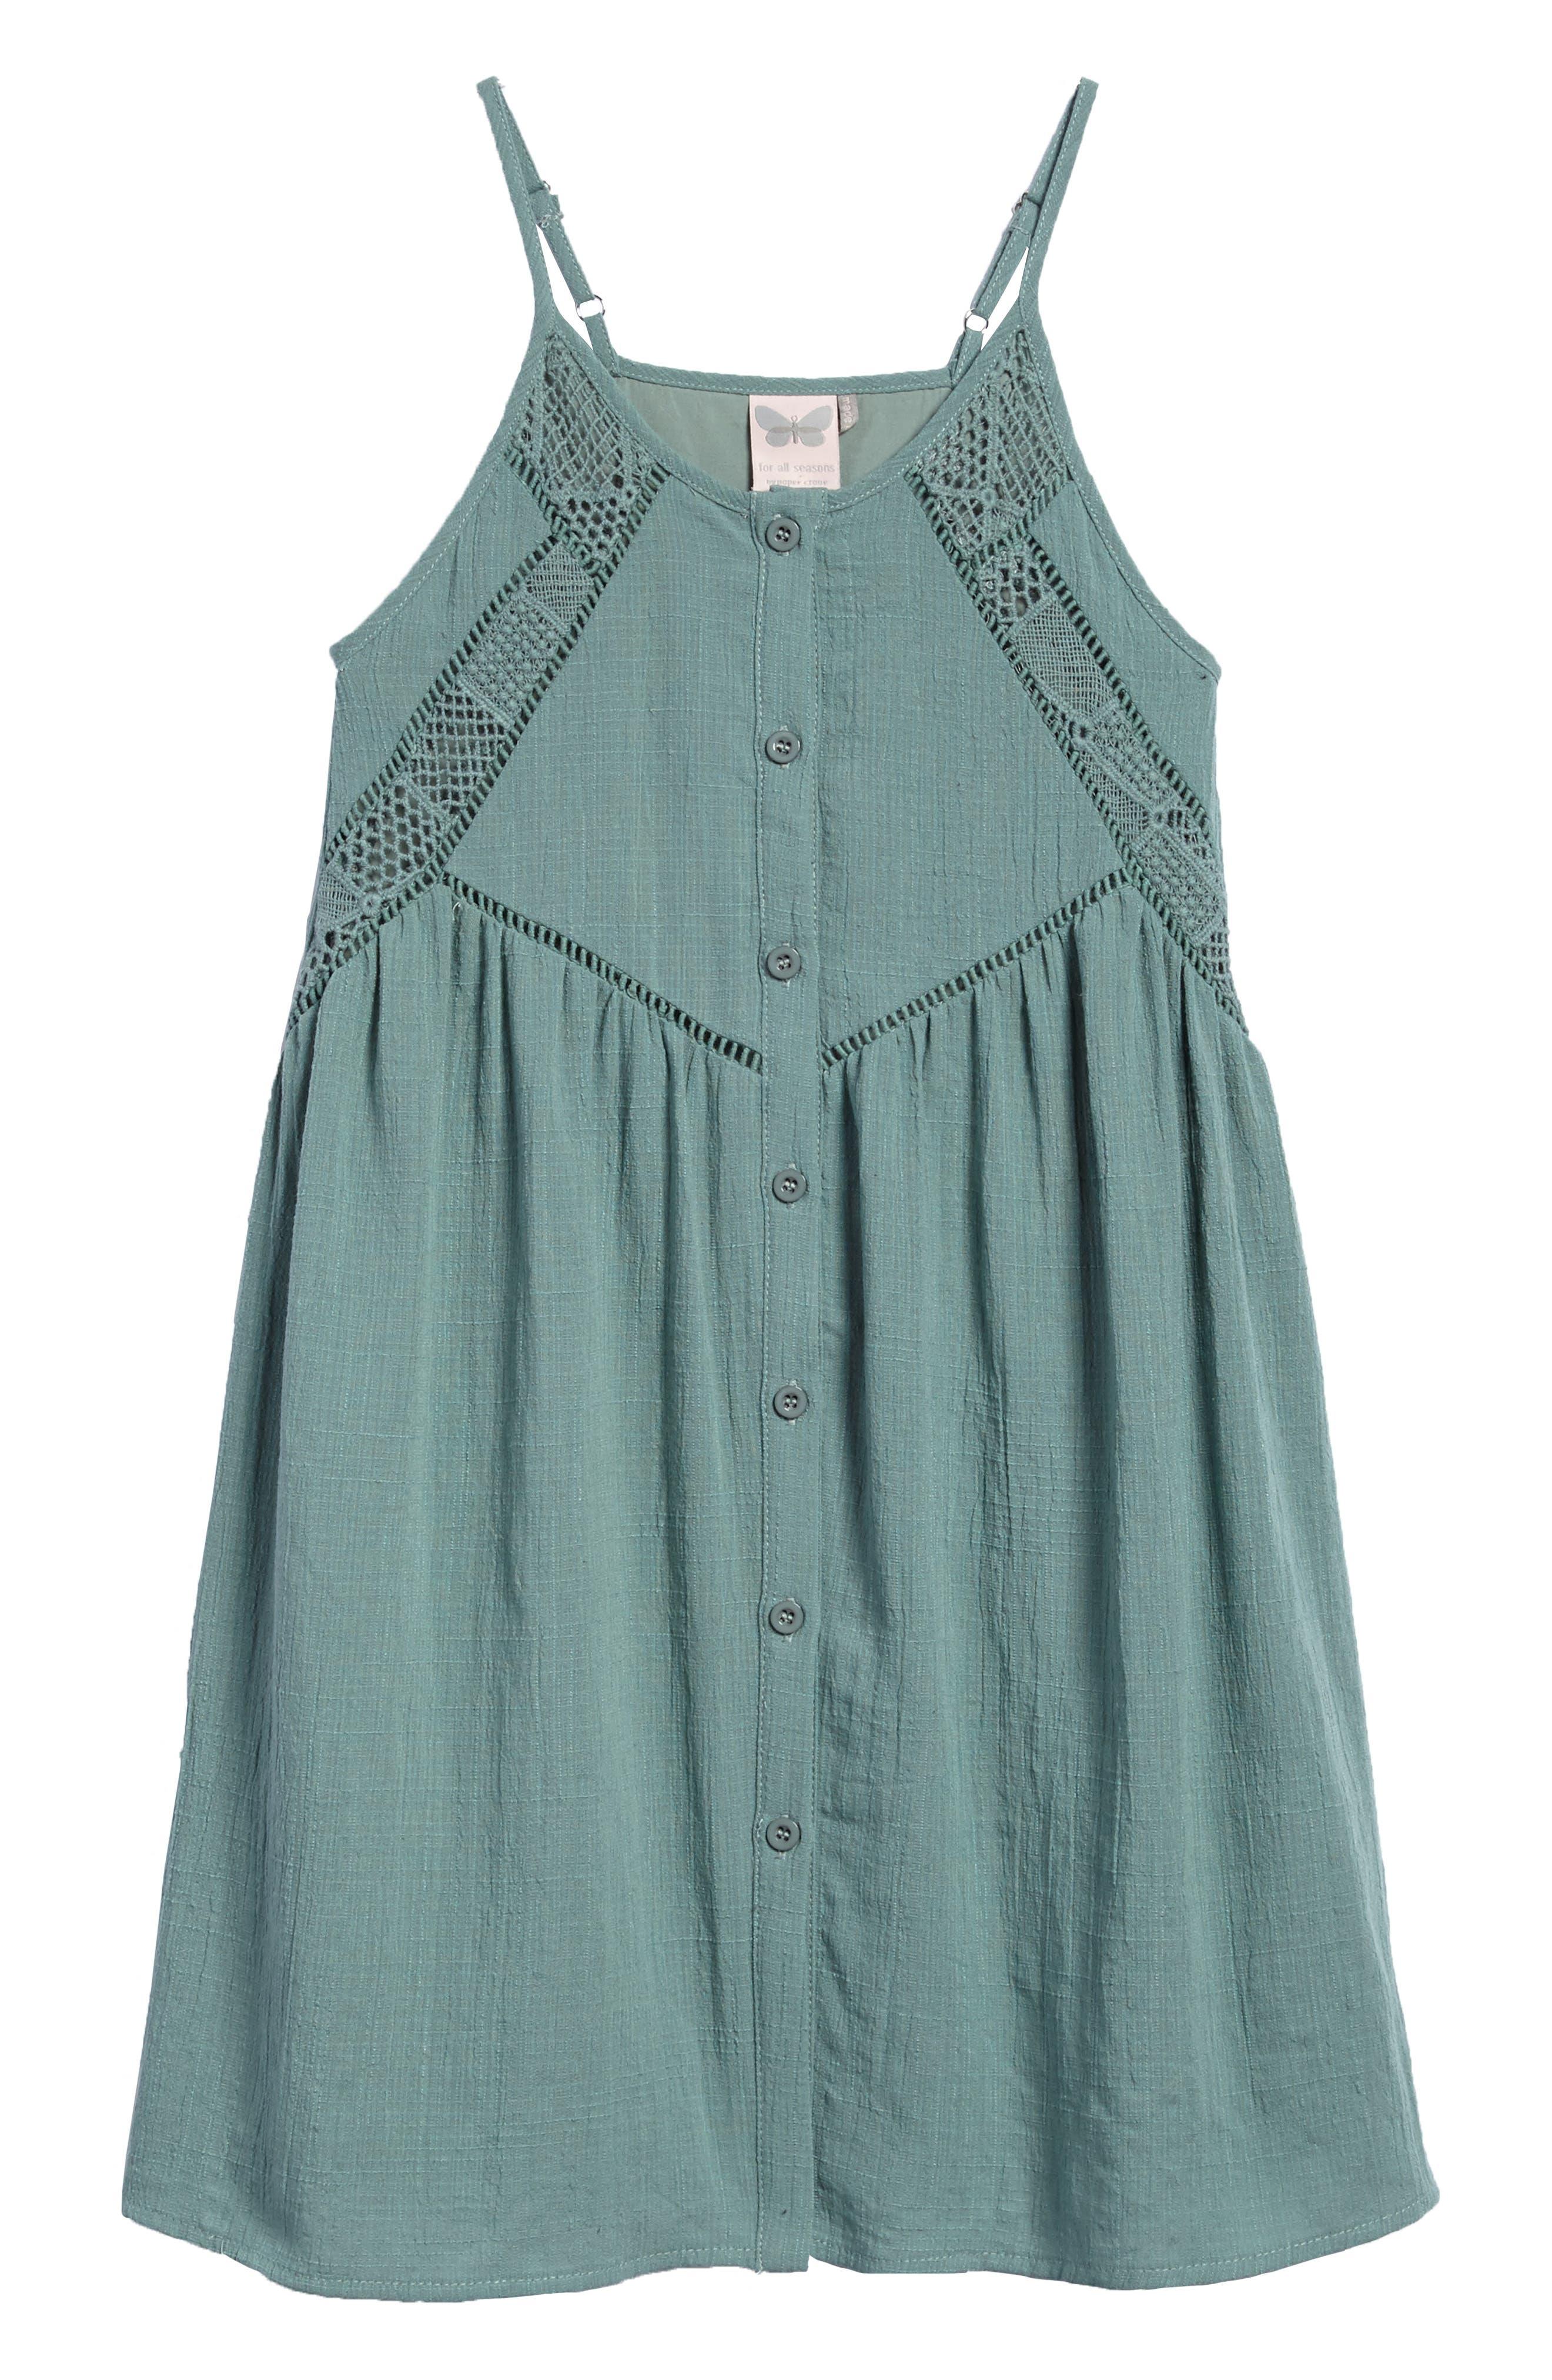 Main Image - For All Season Woven Tank Dress (Big Girls)